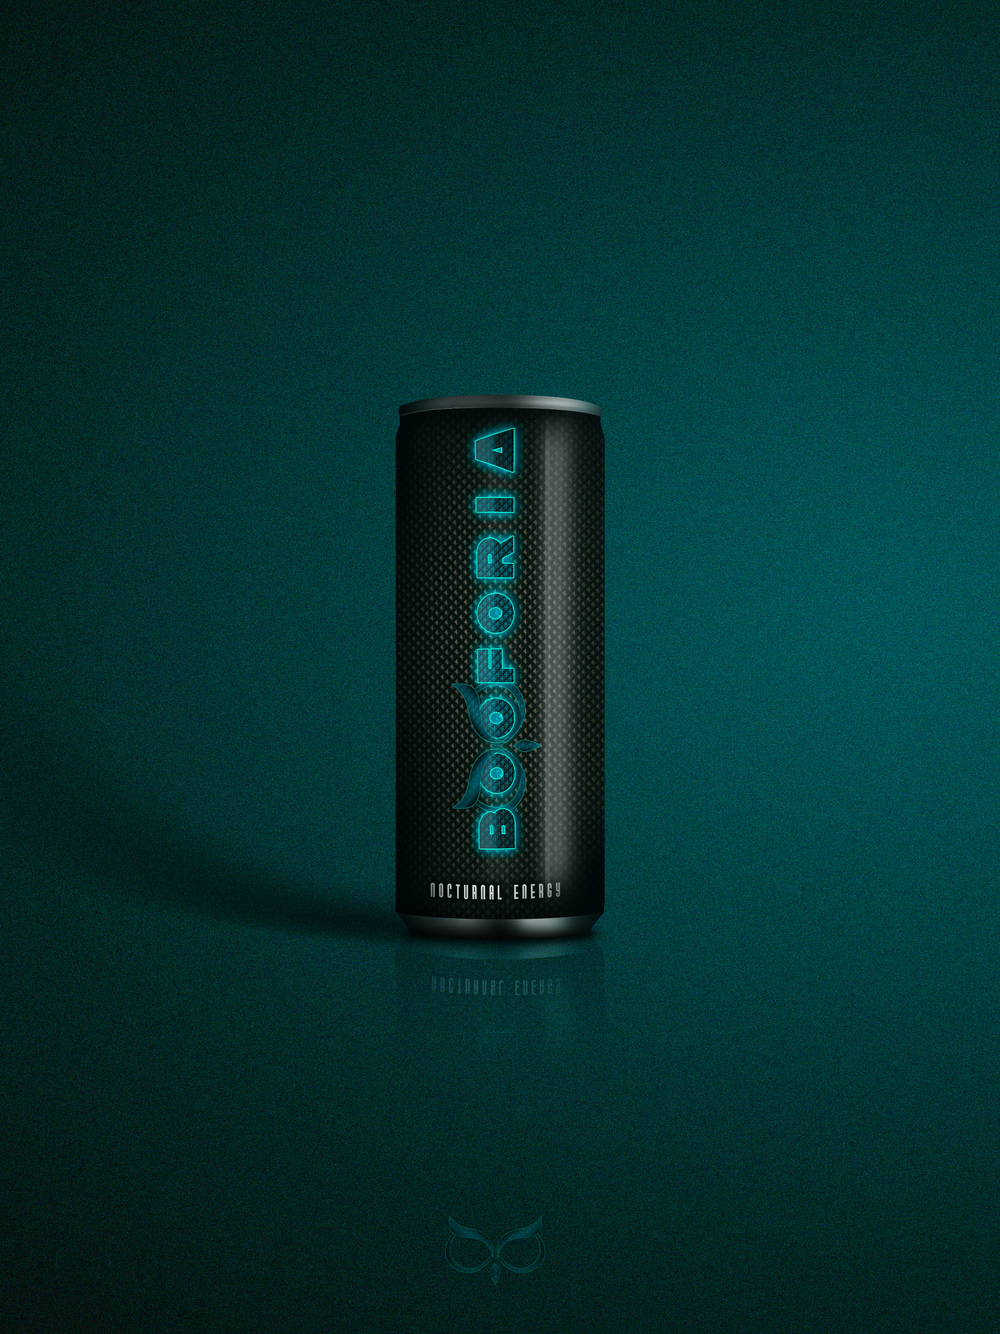 Booforia - energy drink concept